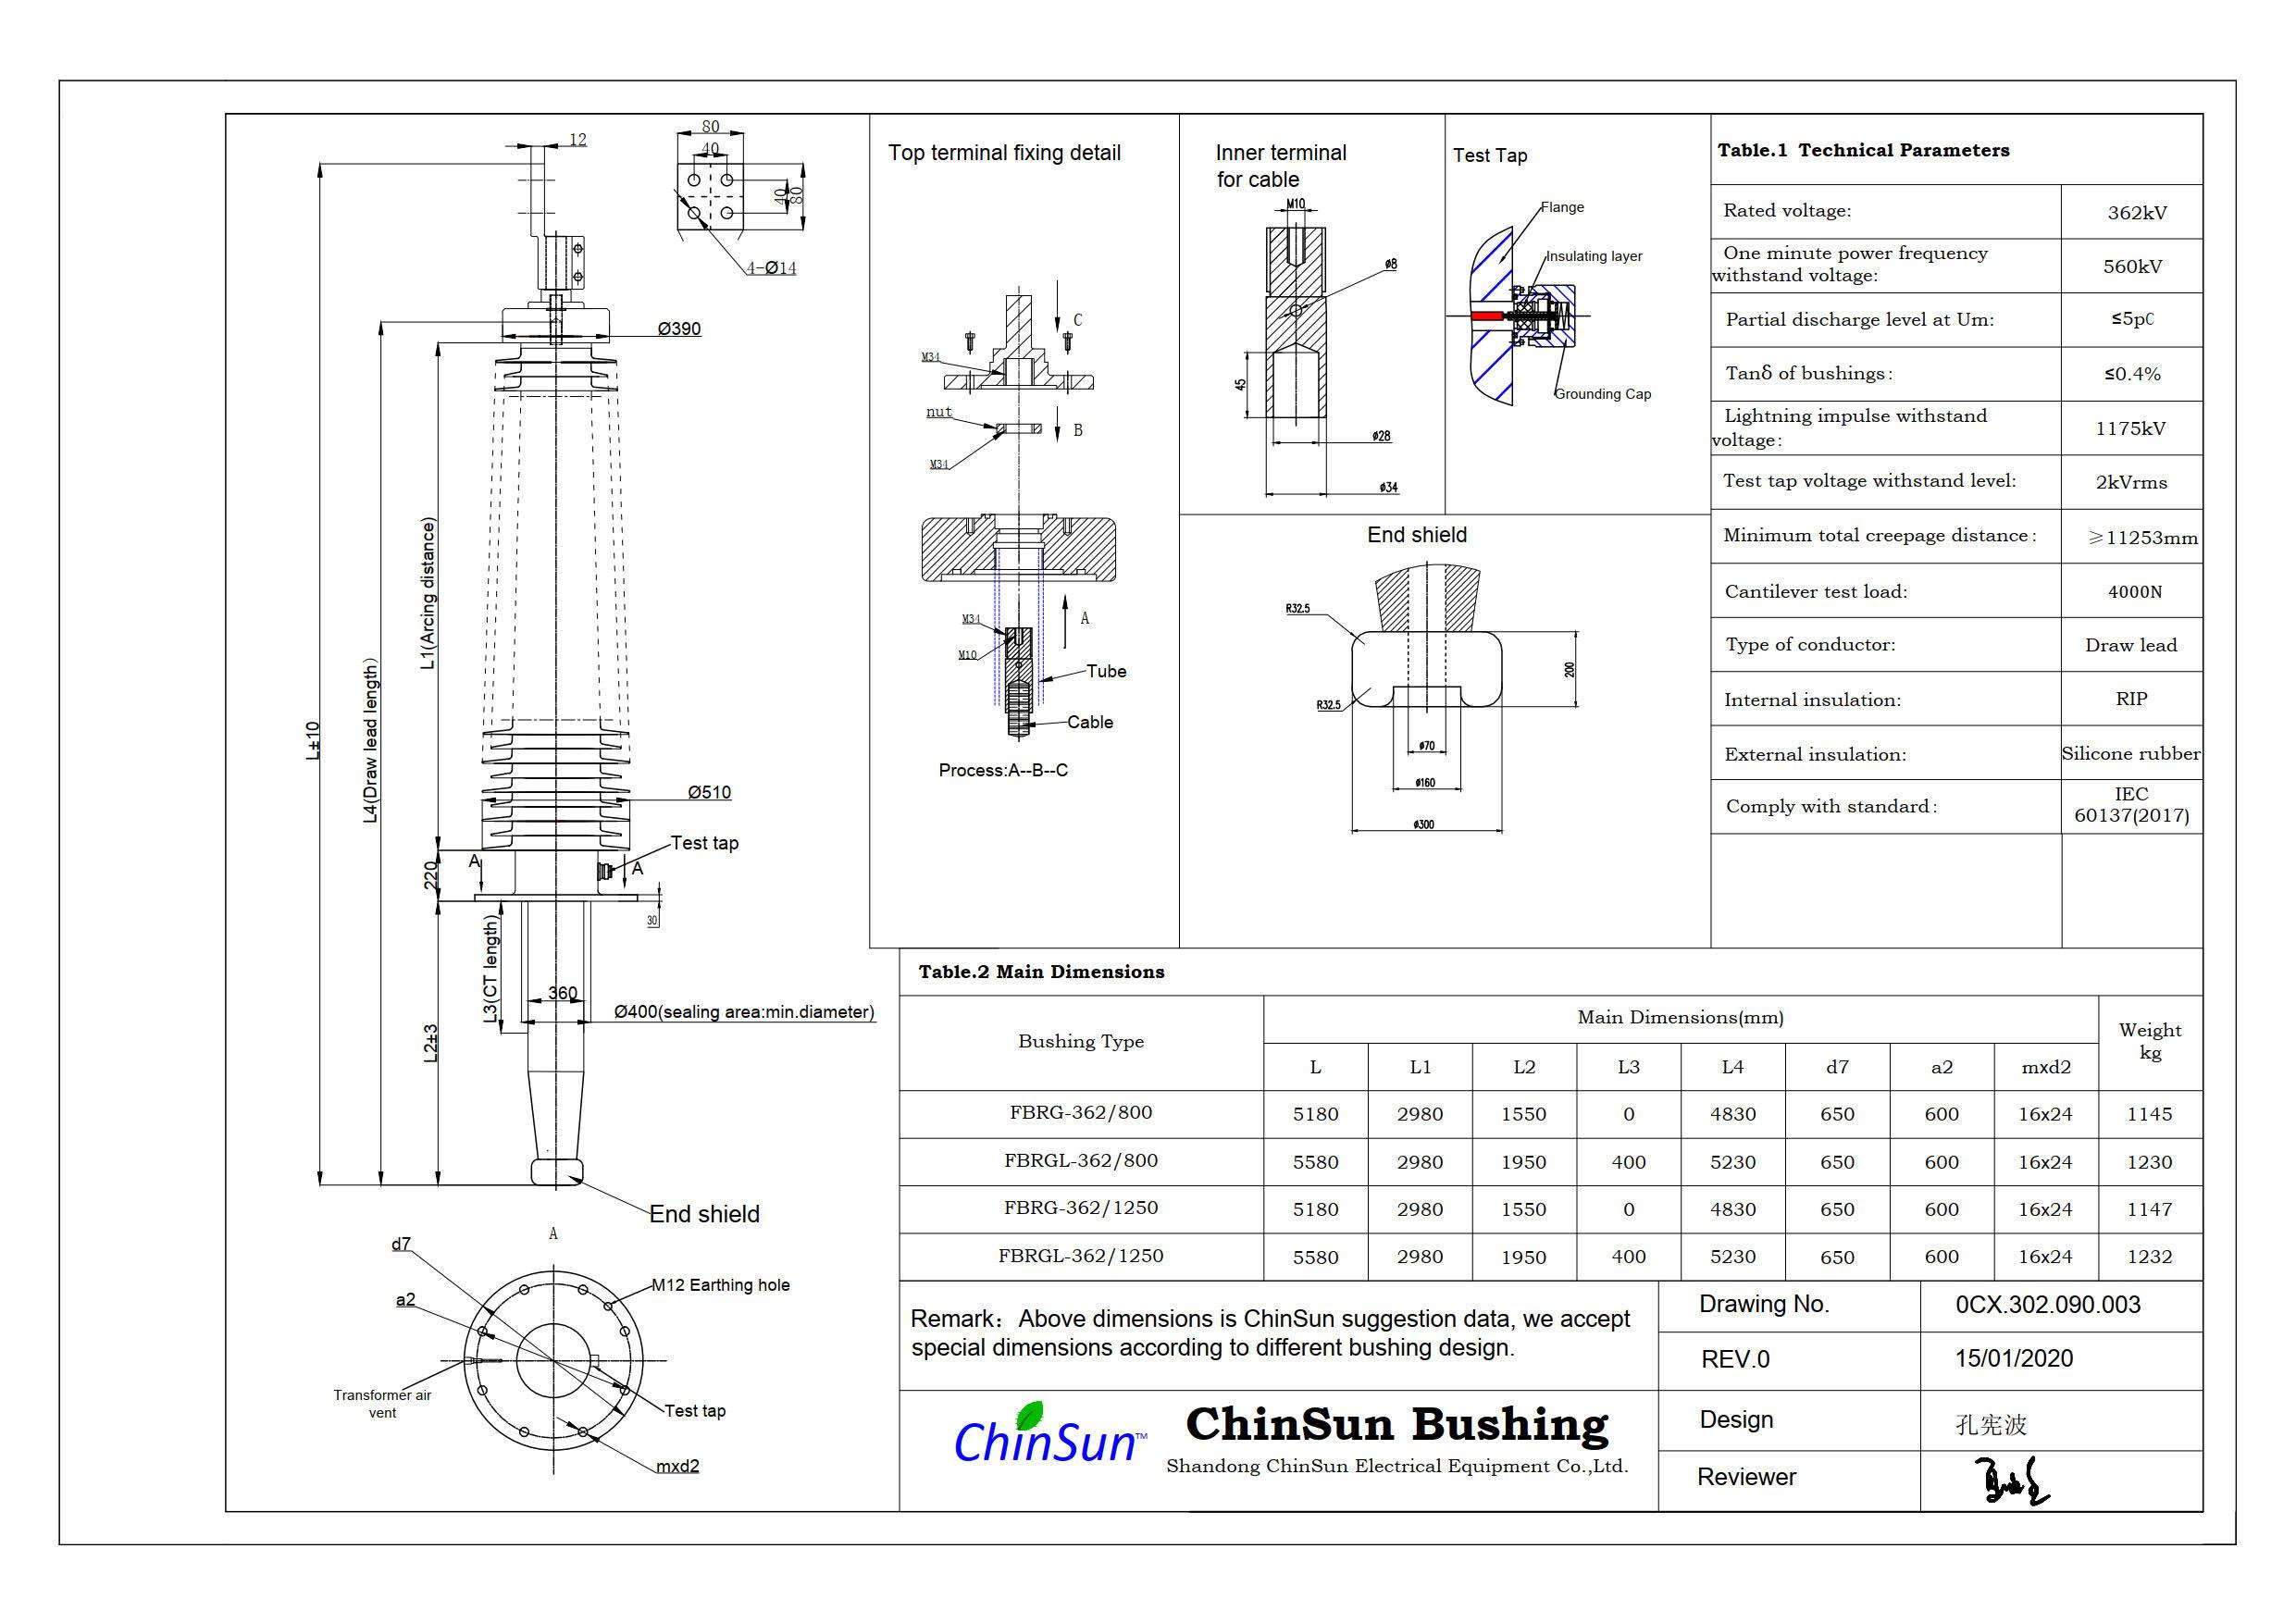 Drawing-transformer bushing-362kV_silicone rubber-DL-ChinSun